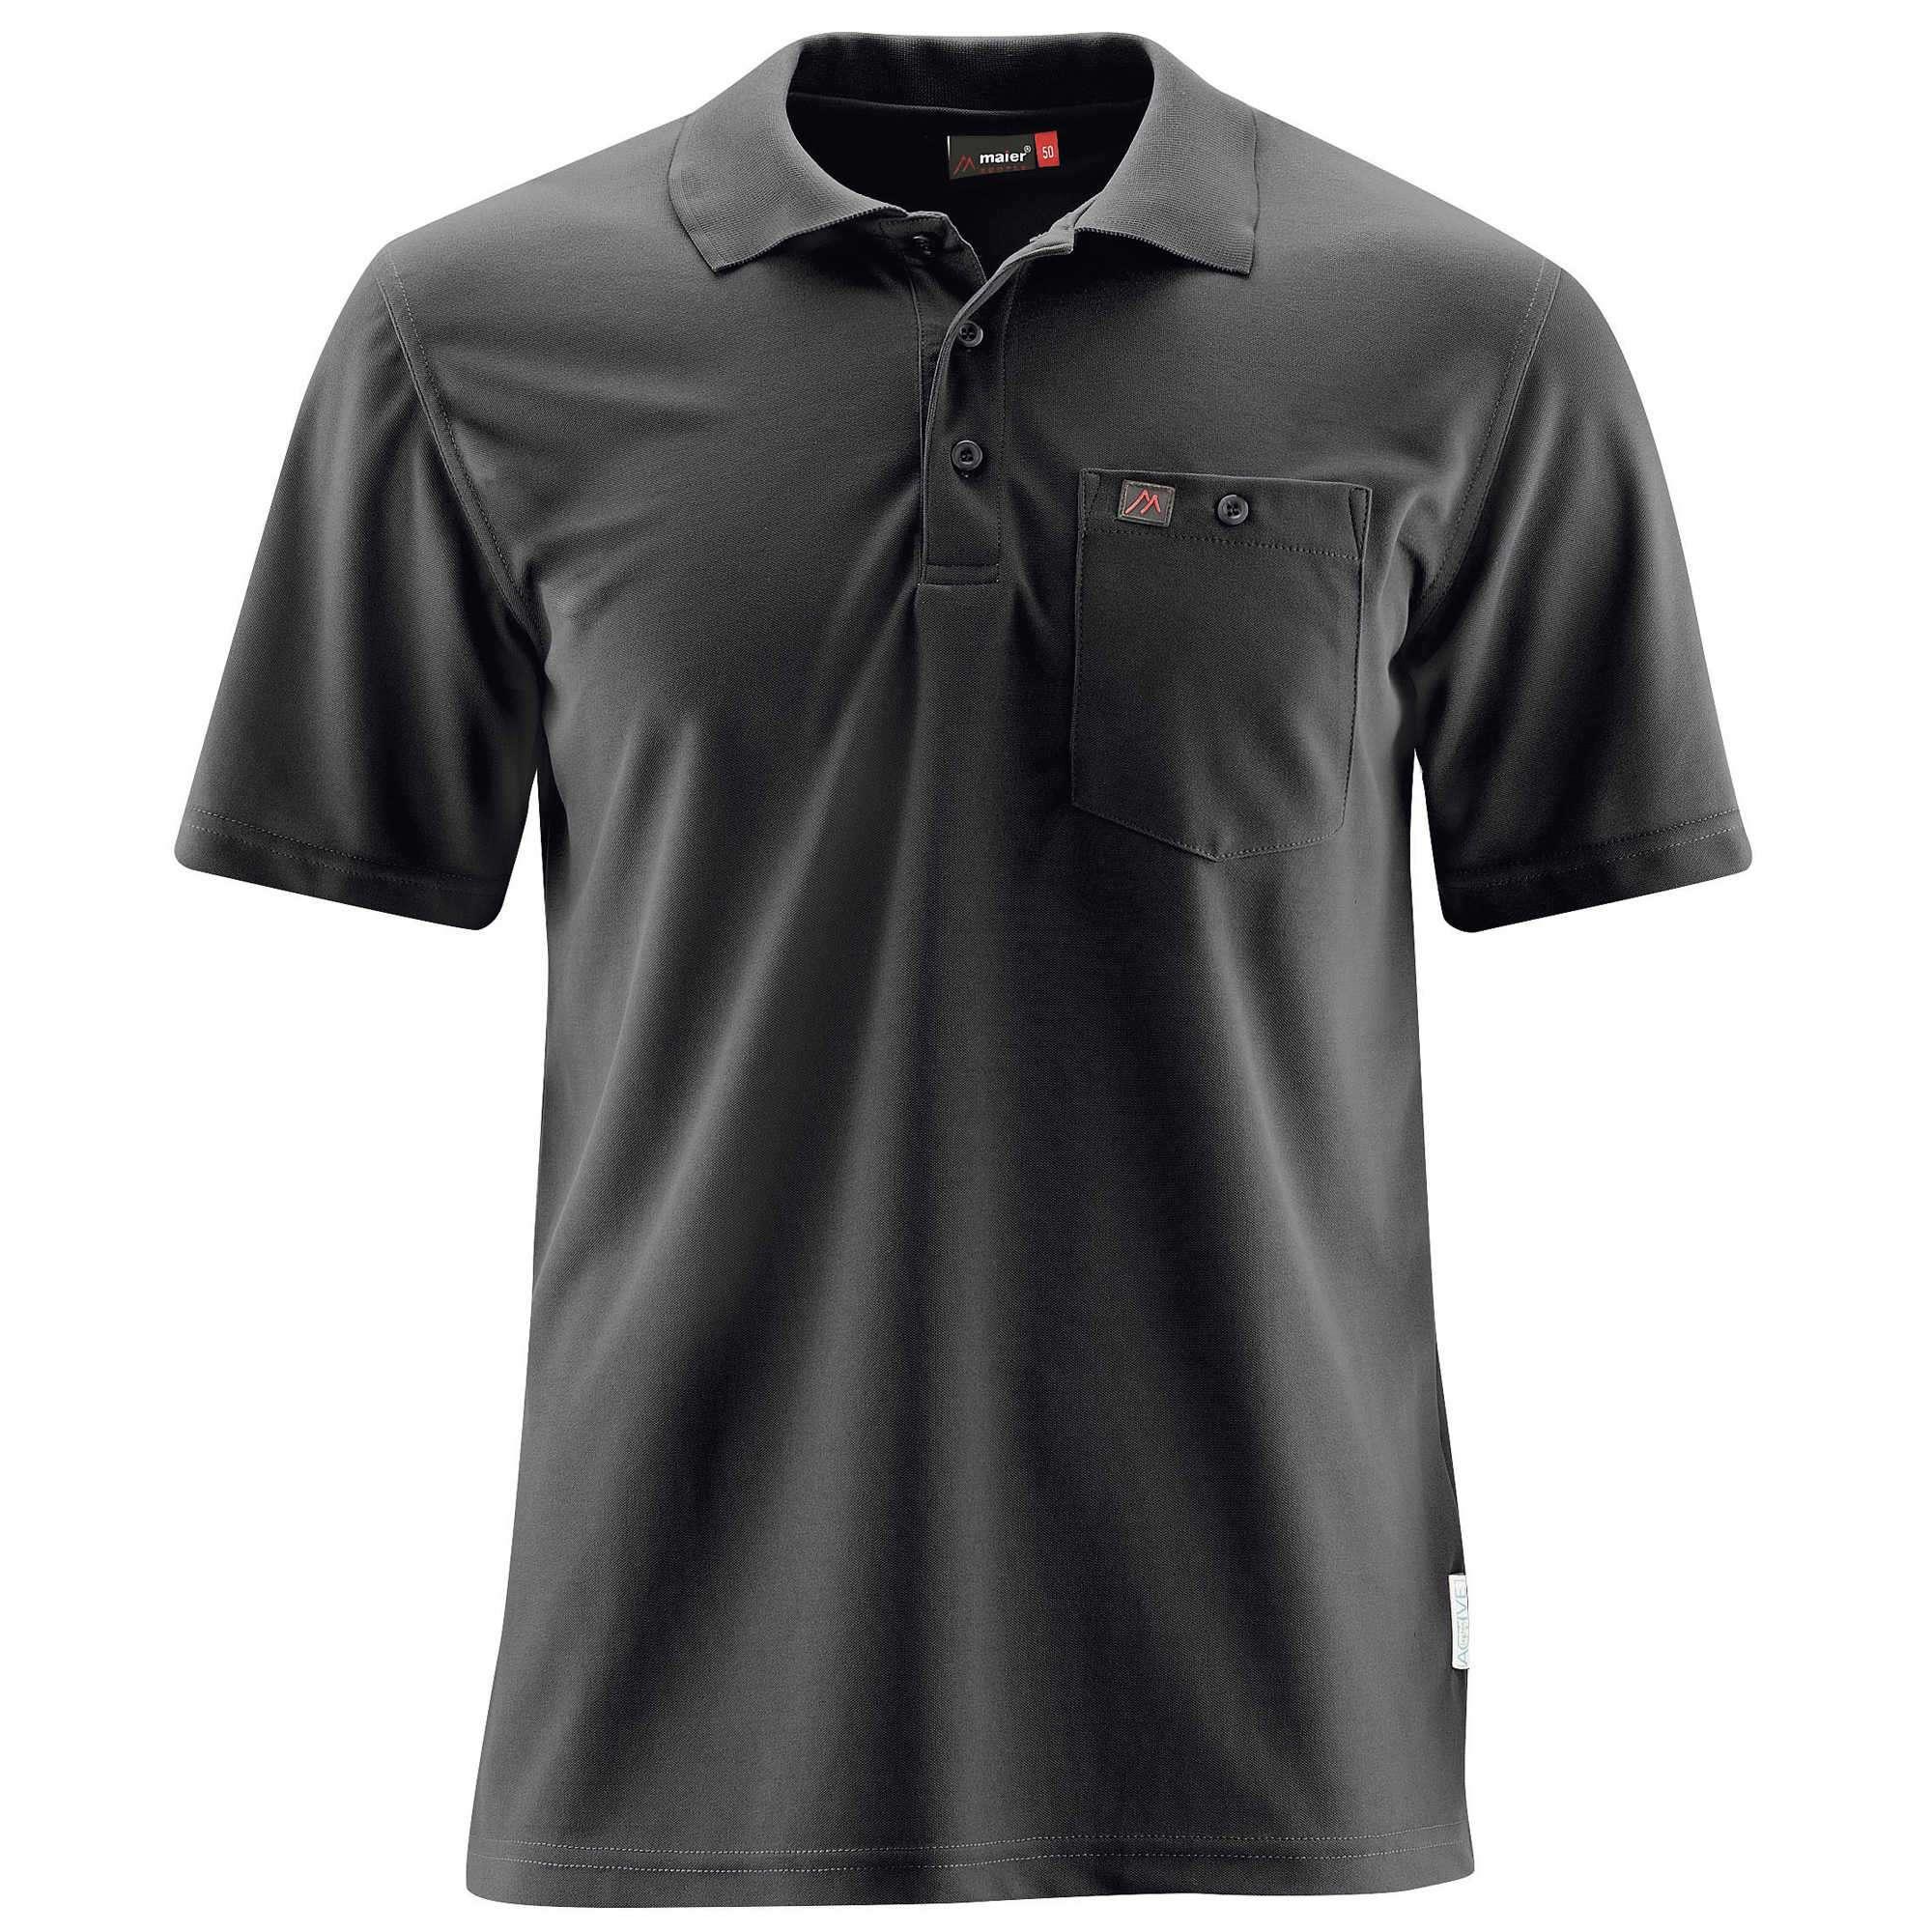 Maier Sports Kalatti - Herren Polo-Shirt Große Größe